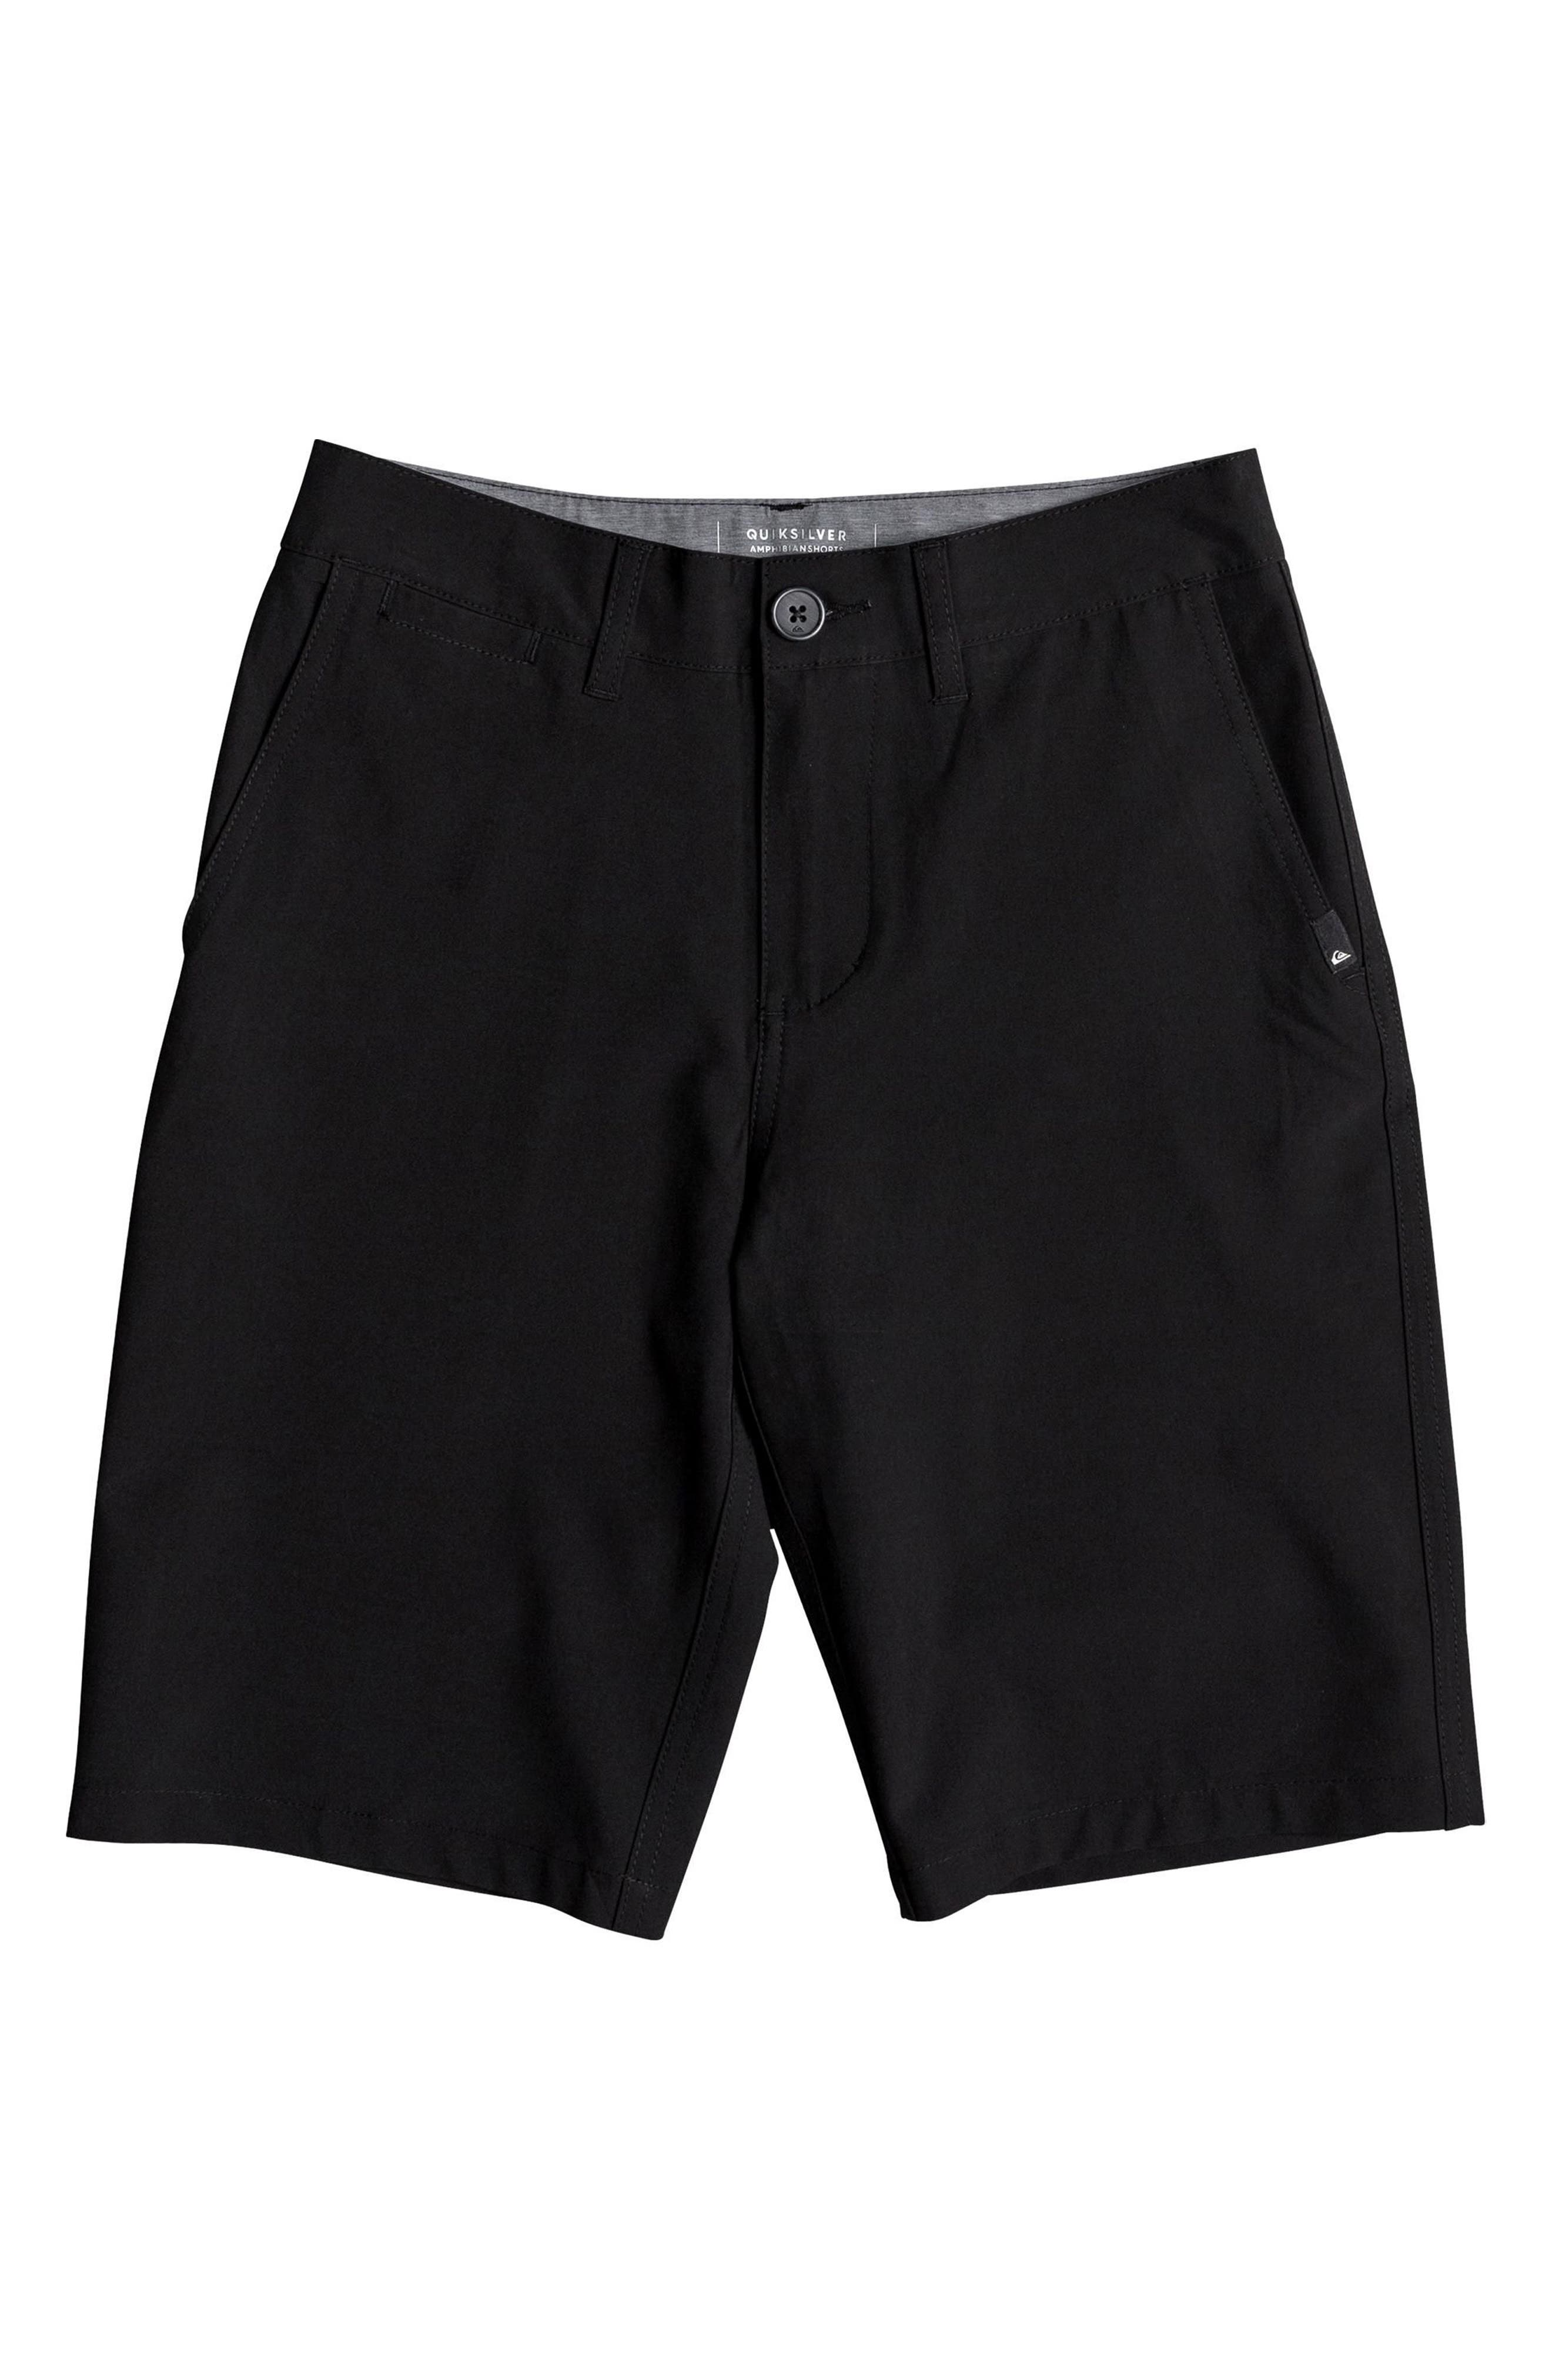 Union Amphibian Hybrid Shorts,                             Main thumbnail 1, color,                             002